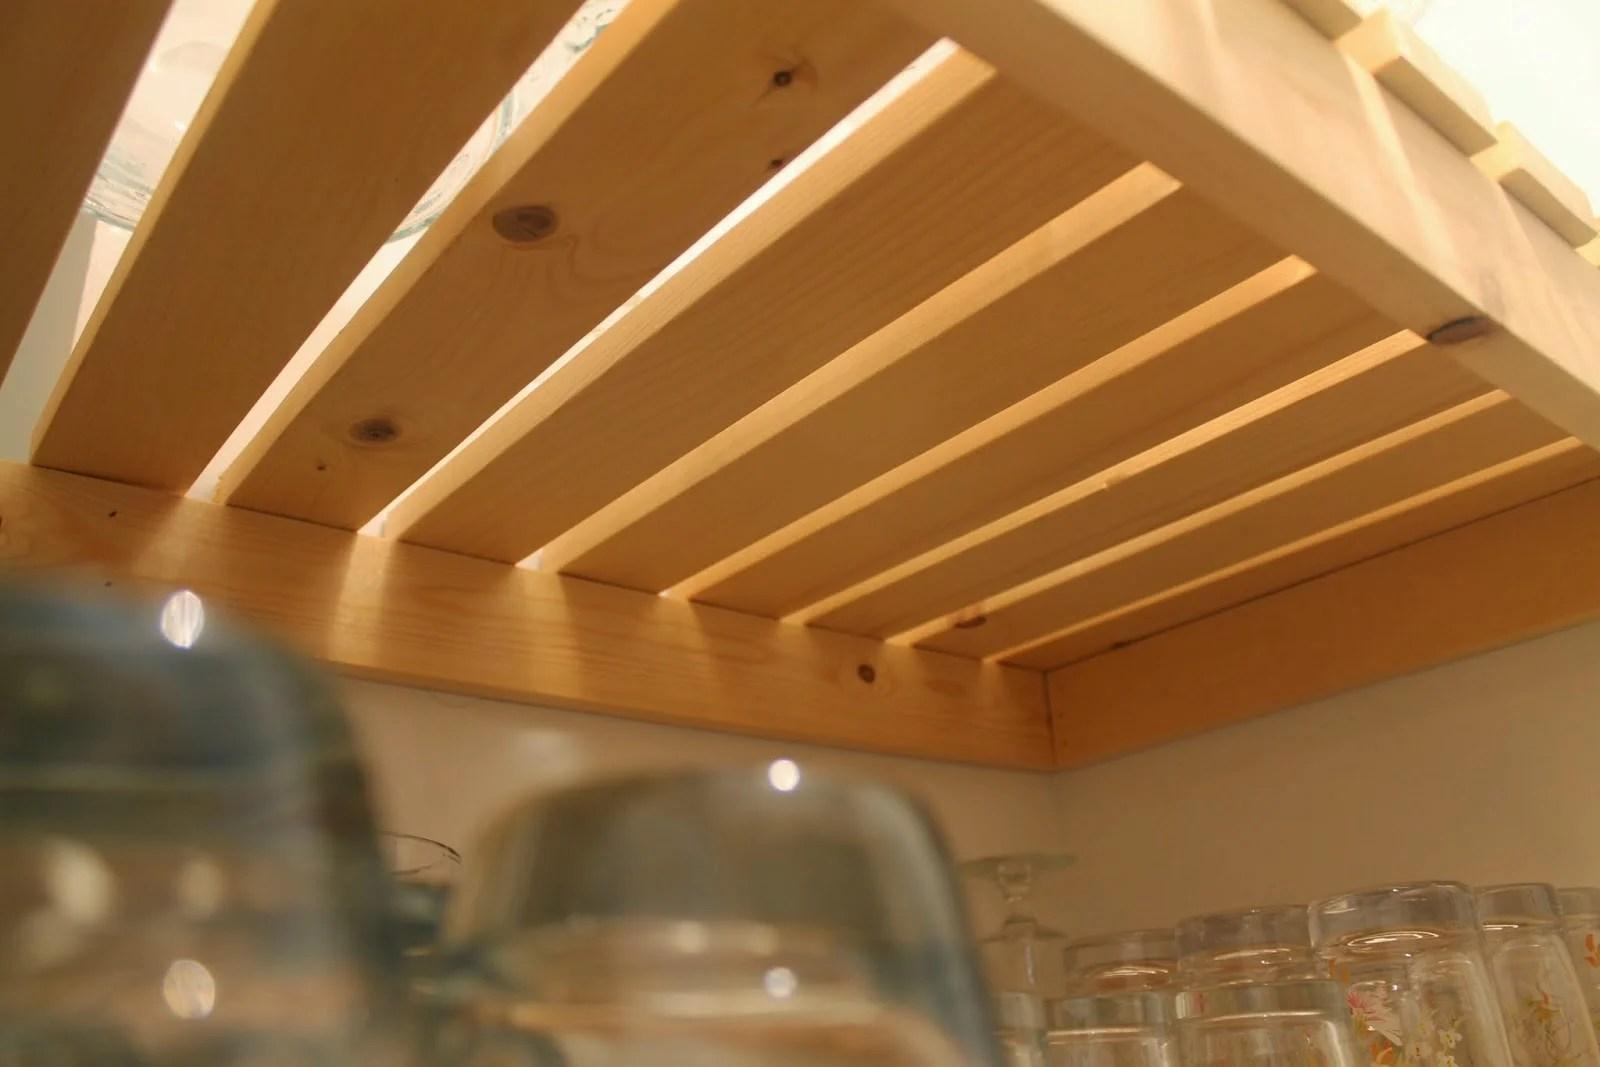 Wood Slat Pantry Shelving Diy Girl Meets Carpenter On Remodelaholic